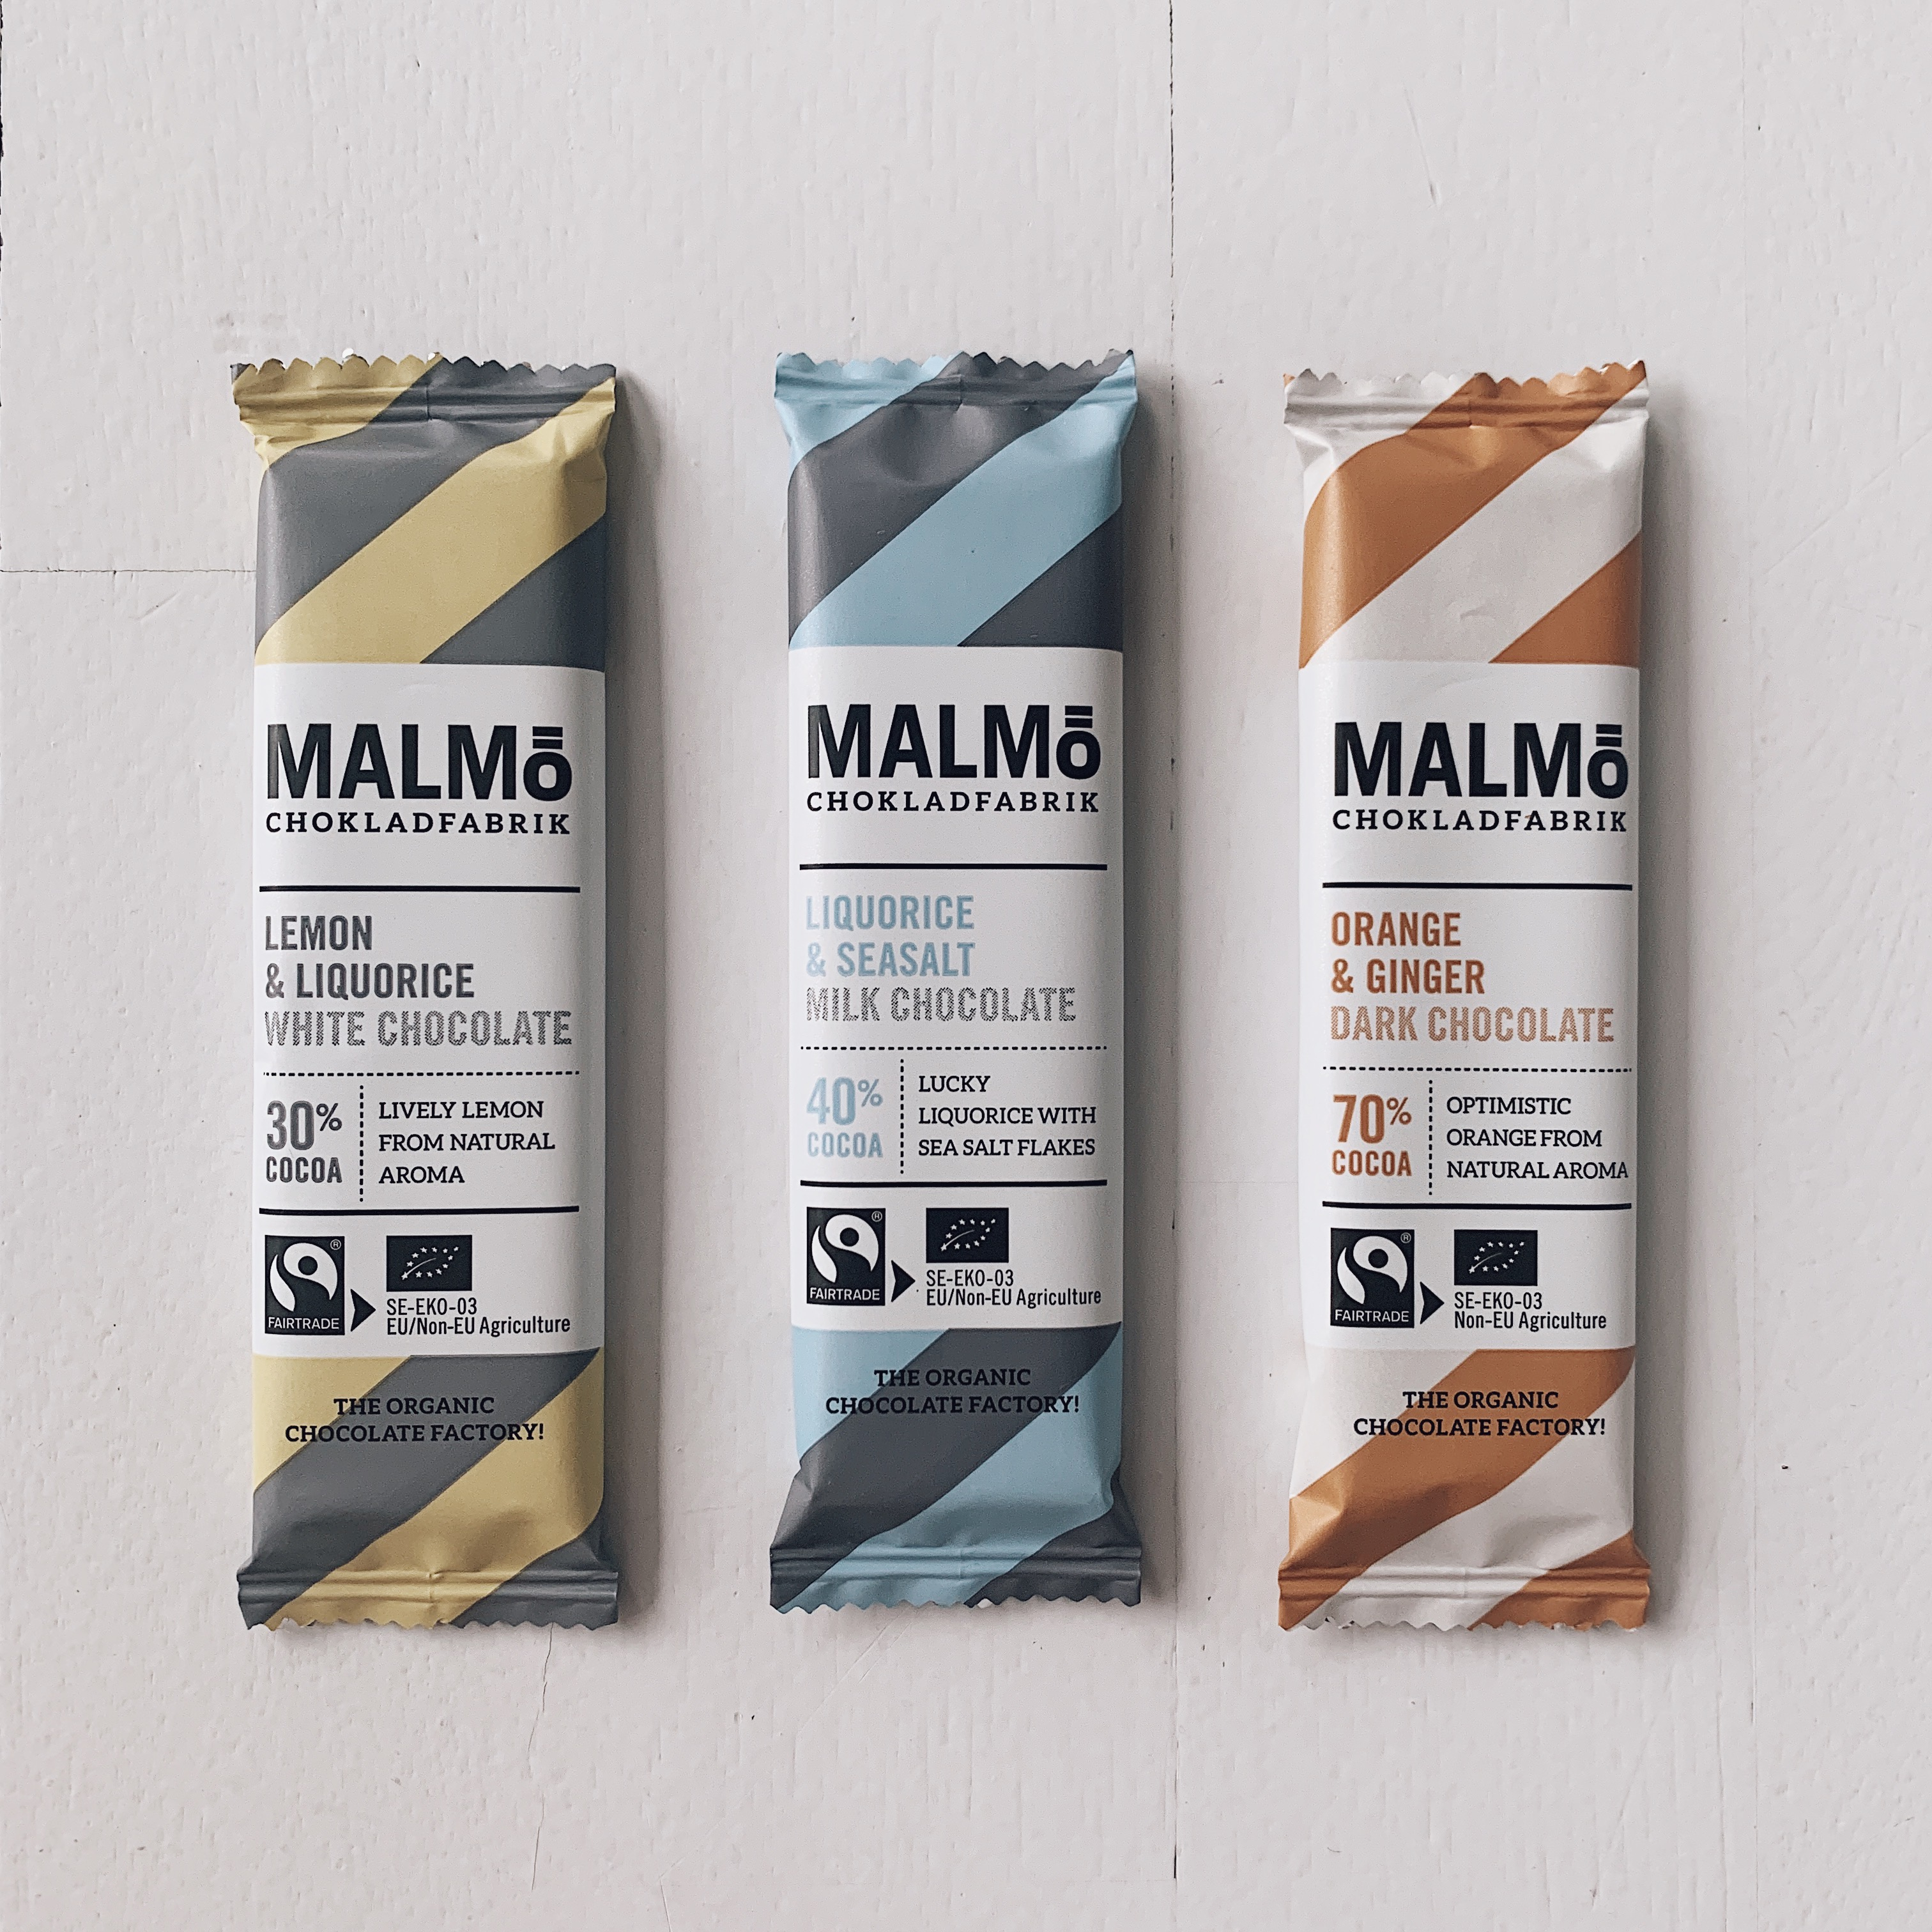 Malmø Chokladfabrik Minibar - 3 smaker -